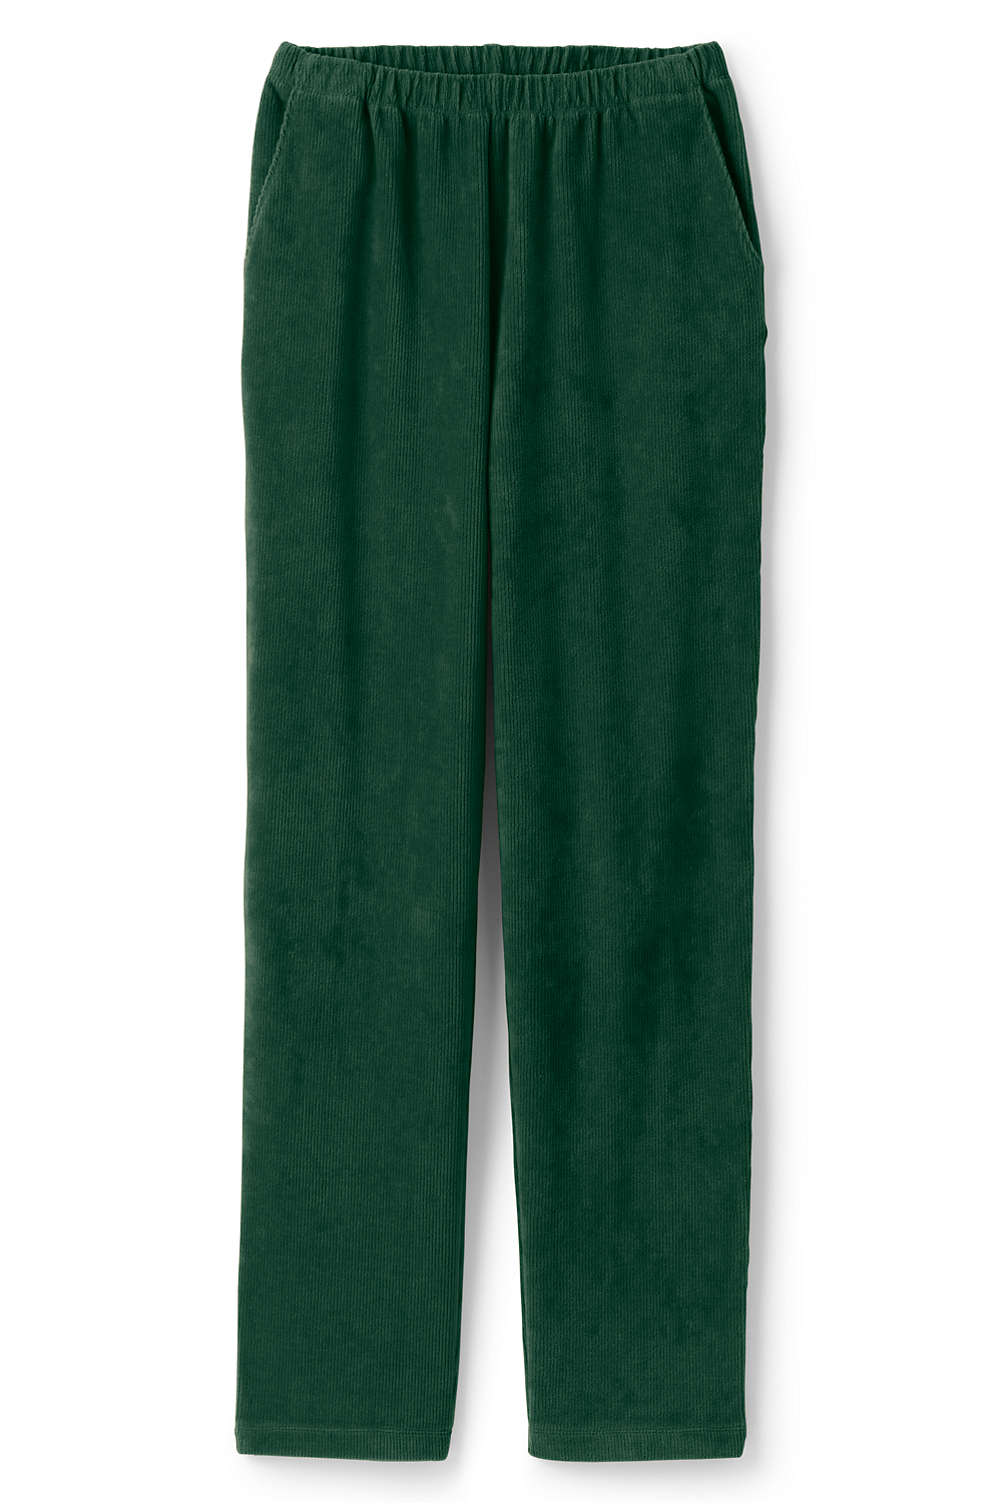 7dcada0fadf7 Women's Sport Knit Corduroy Elastic Waist Pants High Rise